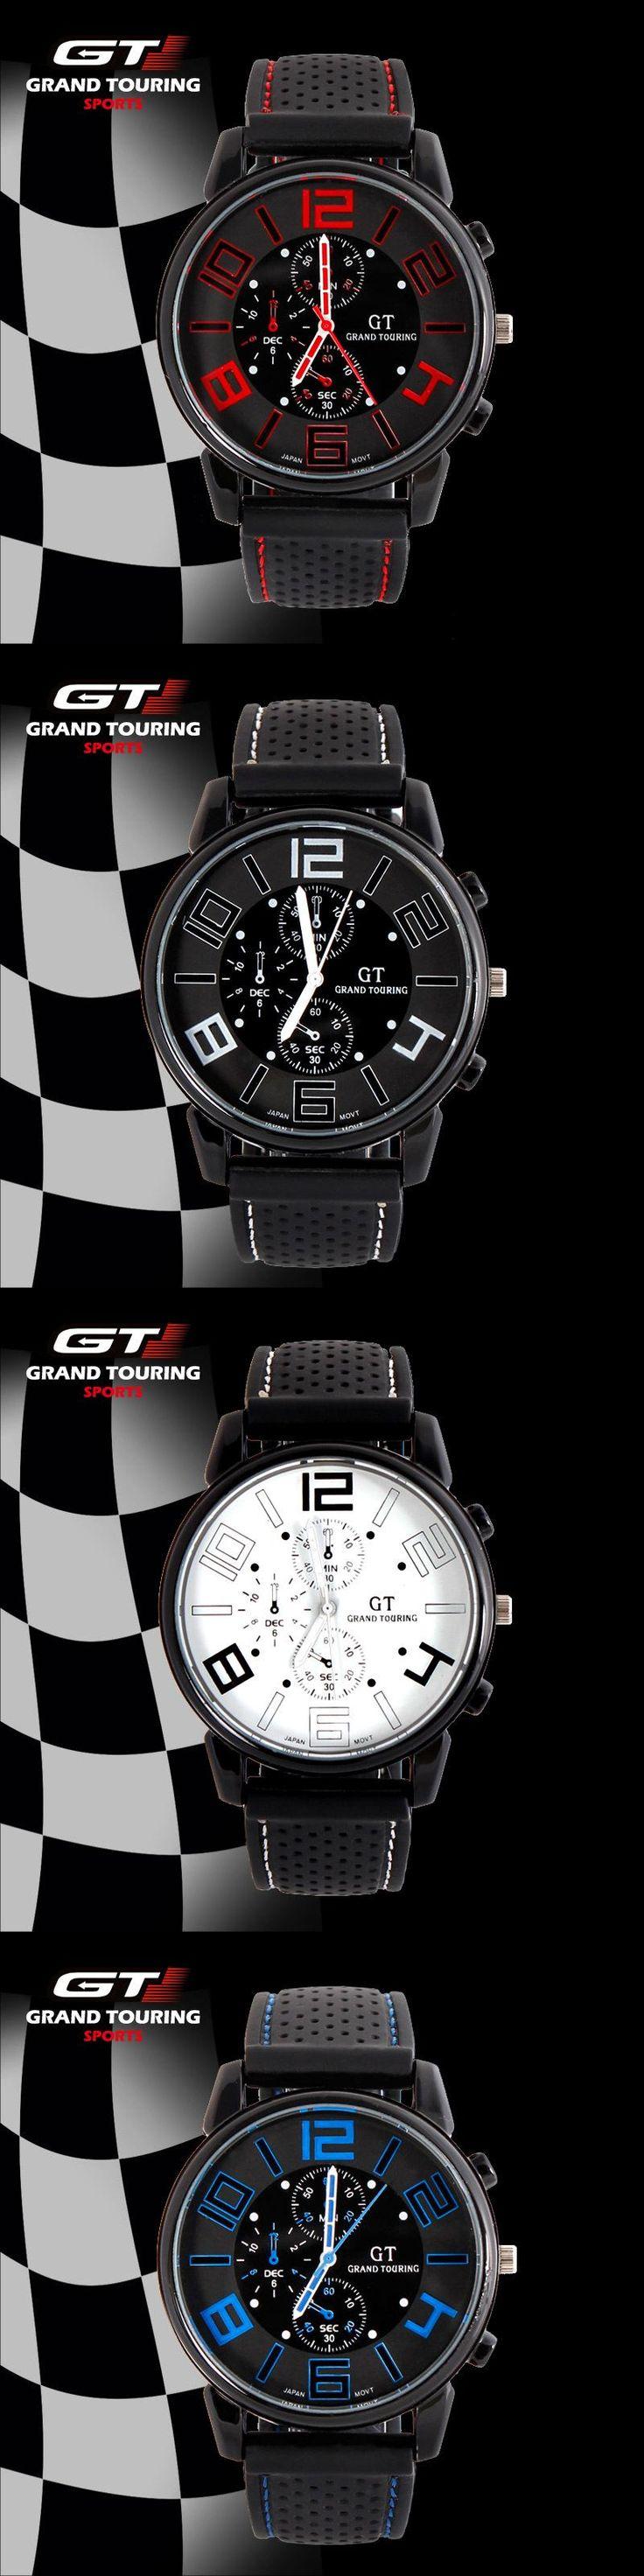 GT WATCH Brand Grand Touring Men Women Silicone Strap Quartz Watch F1 Car Racing Style Military Sports Wristwatch 2016 New